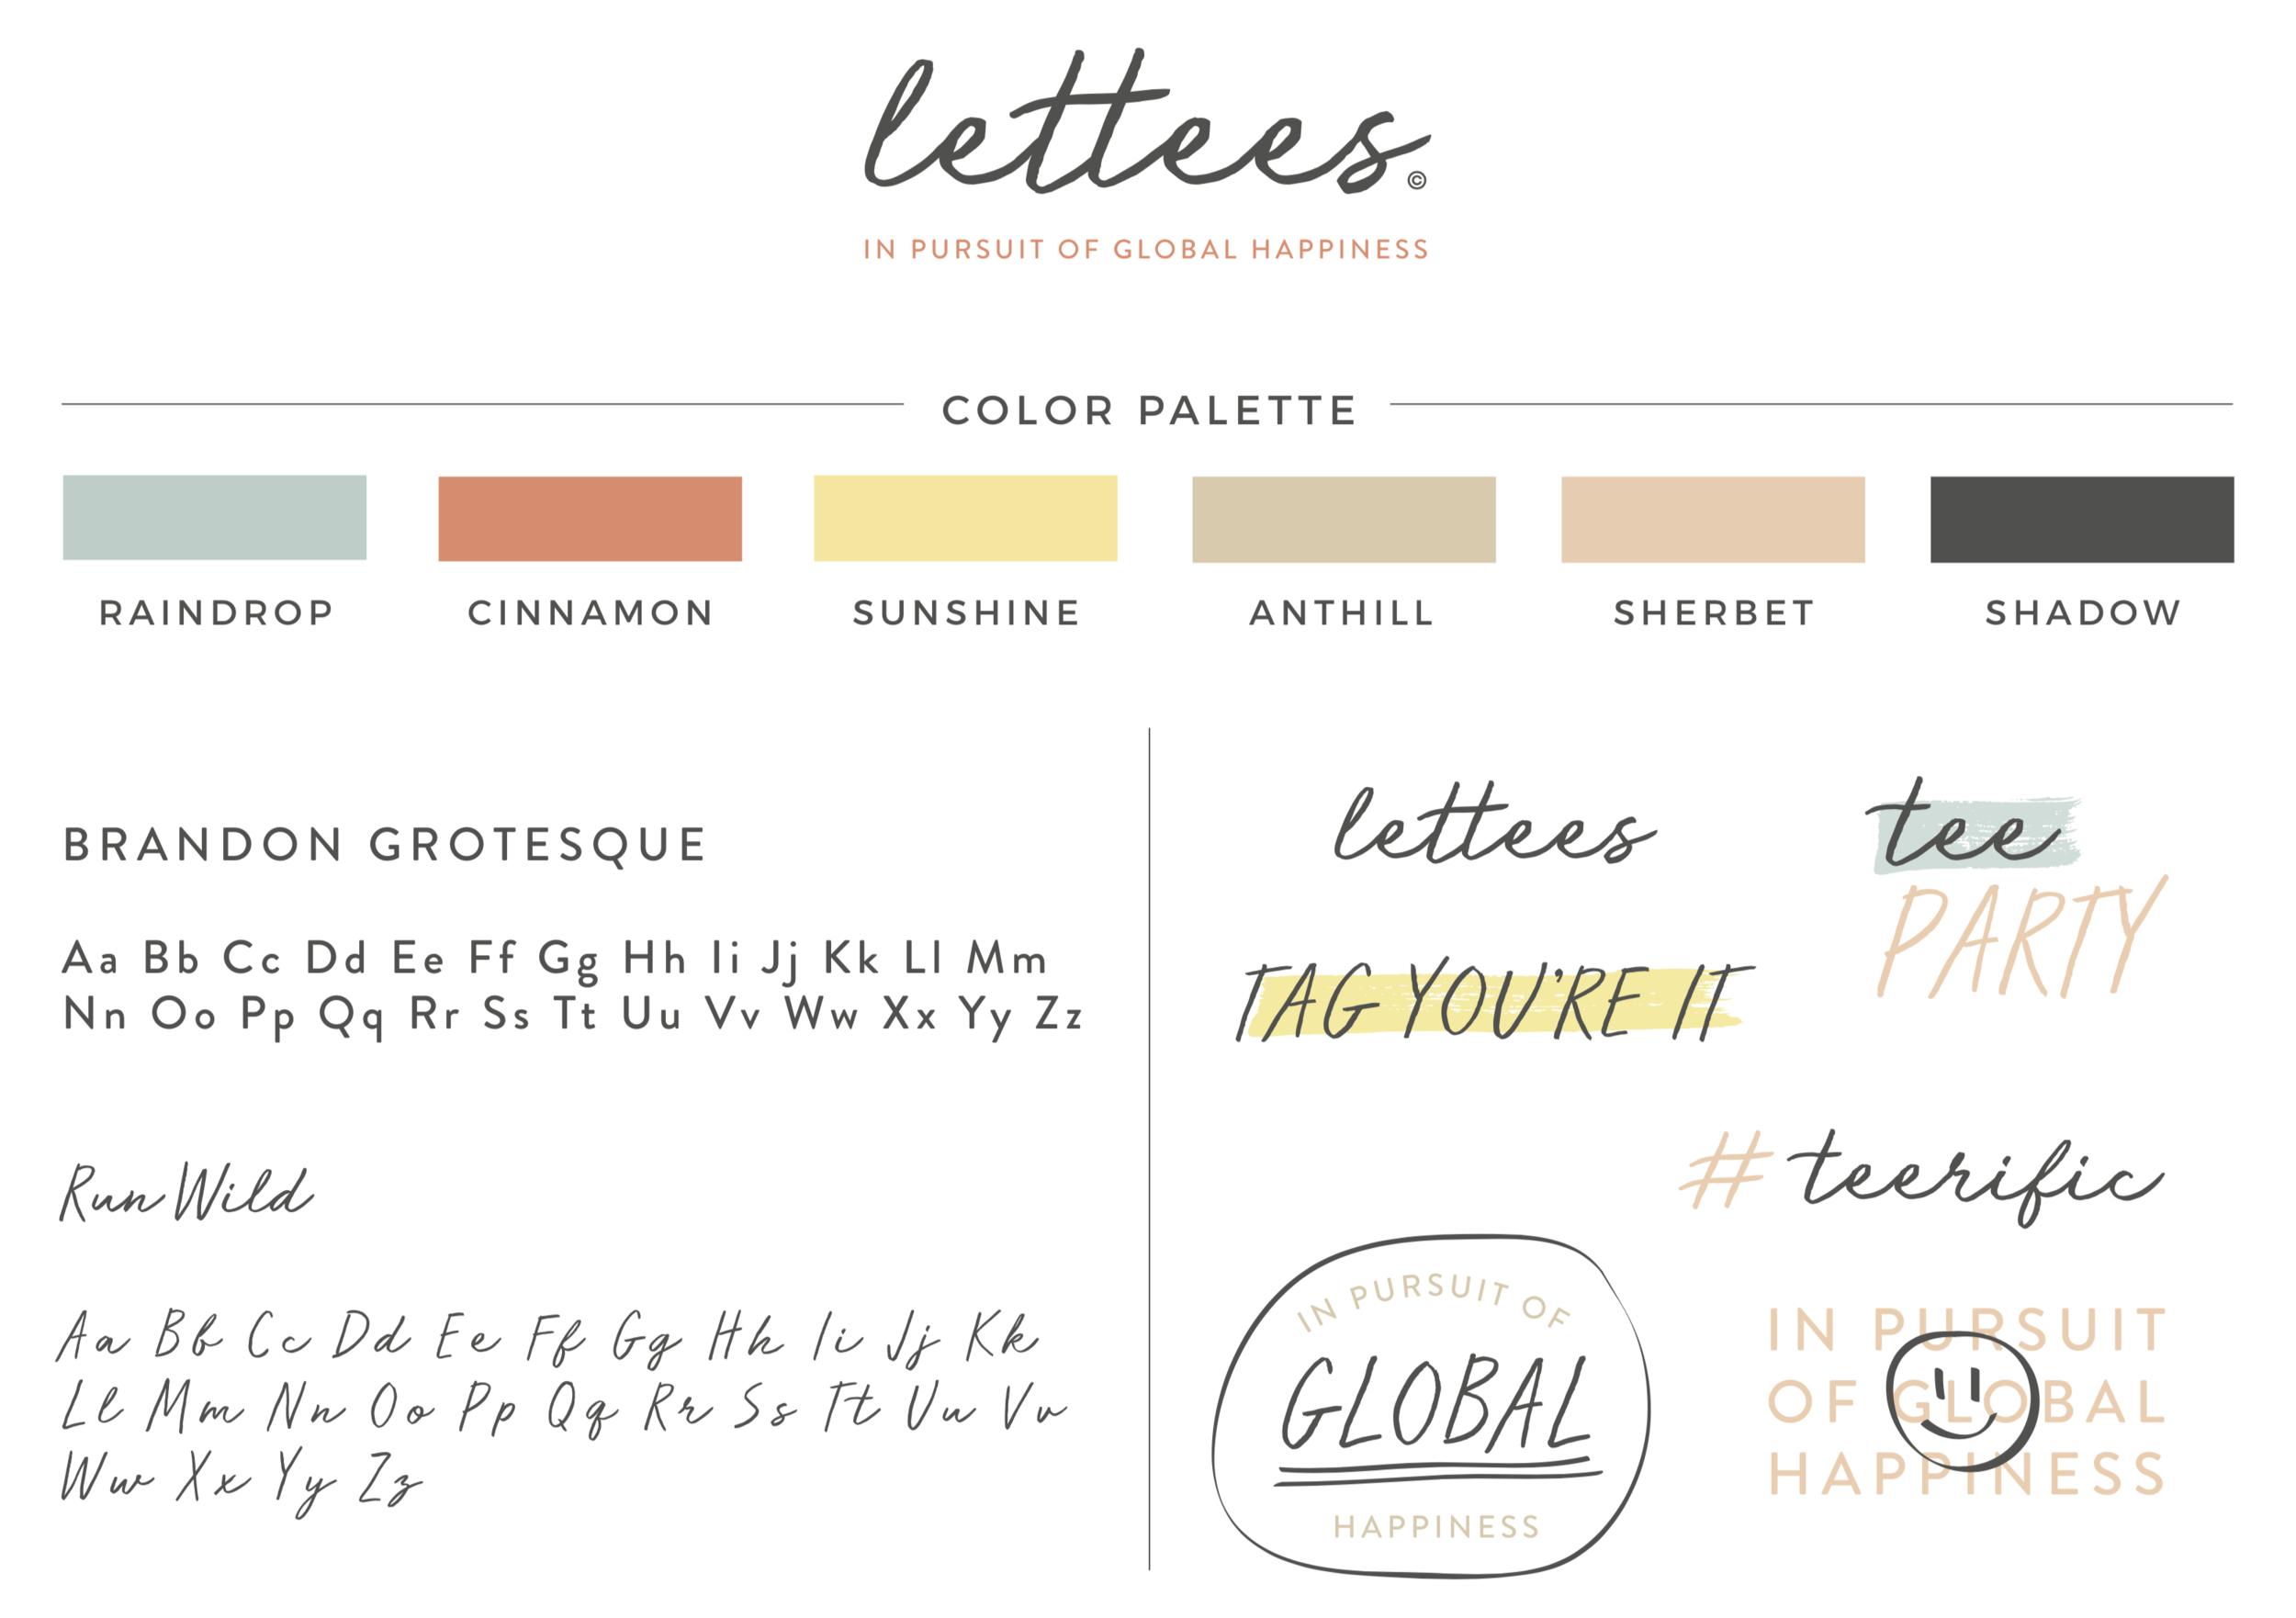 flourish-collaborative-brand-process-lettees-logo-design.png